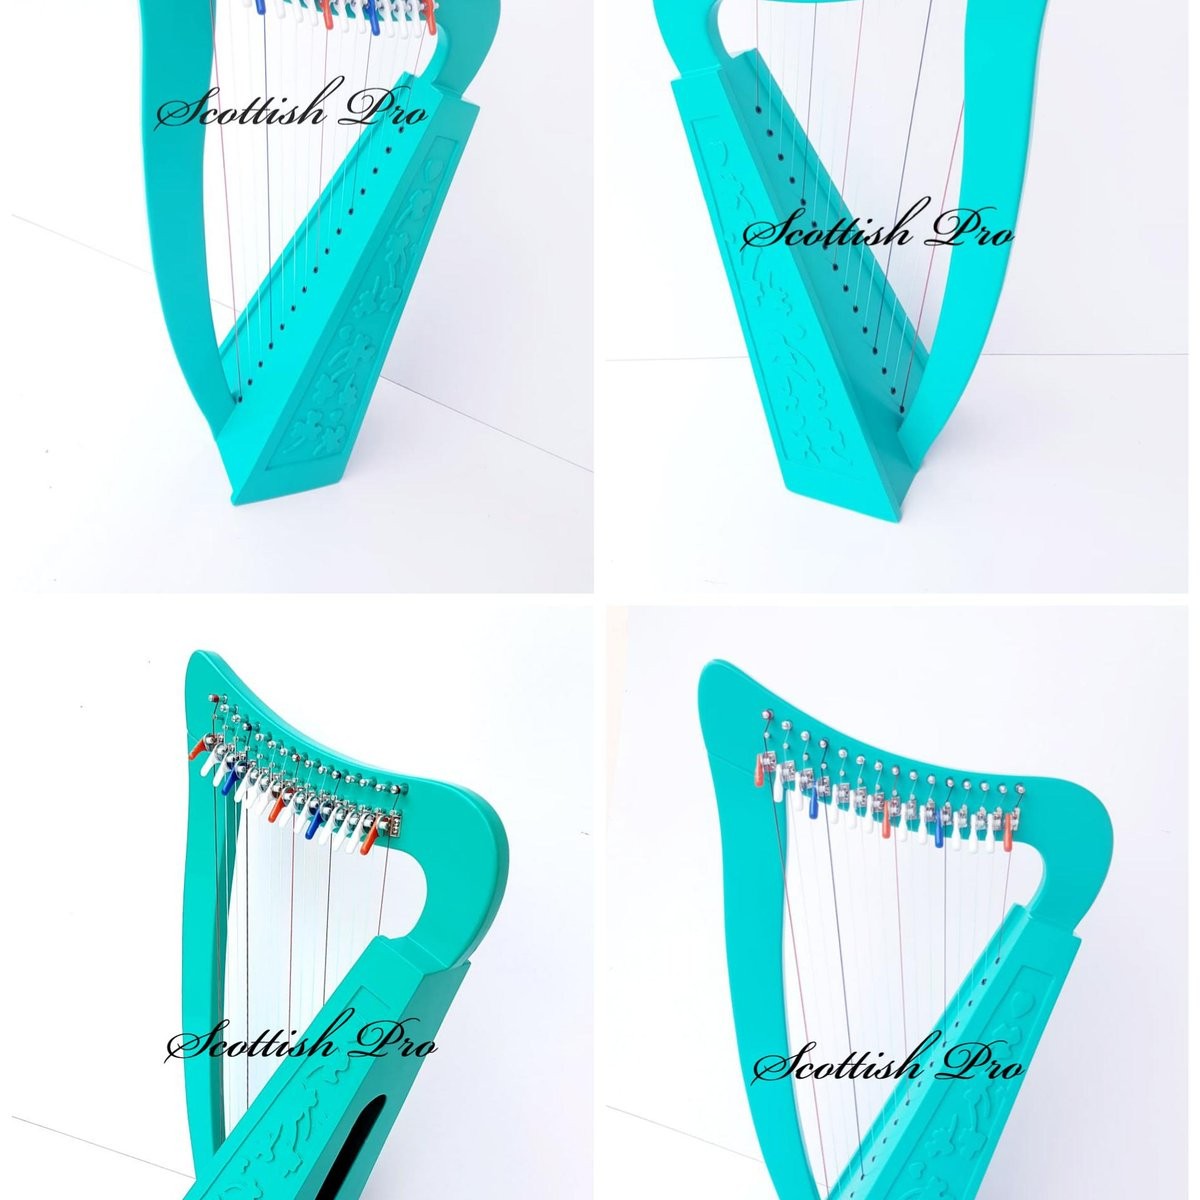 Sell new 15 string rosewood customized colors #harper  #harpstrings  #harpertsworld  #harpest  #playingharp  #usa  #design  #string  #customized  #musician  #musicproduction  #musicbusiness  #musicmarketing  #harpertsworld  #harper  #harpstrings  #stringinstrument  #usa  #canada  #harp  #12string